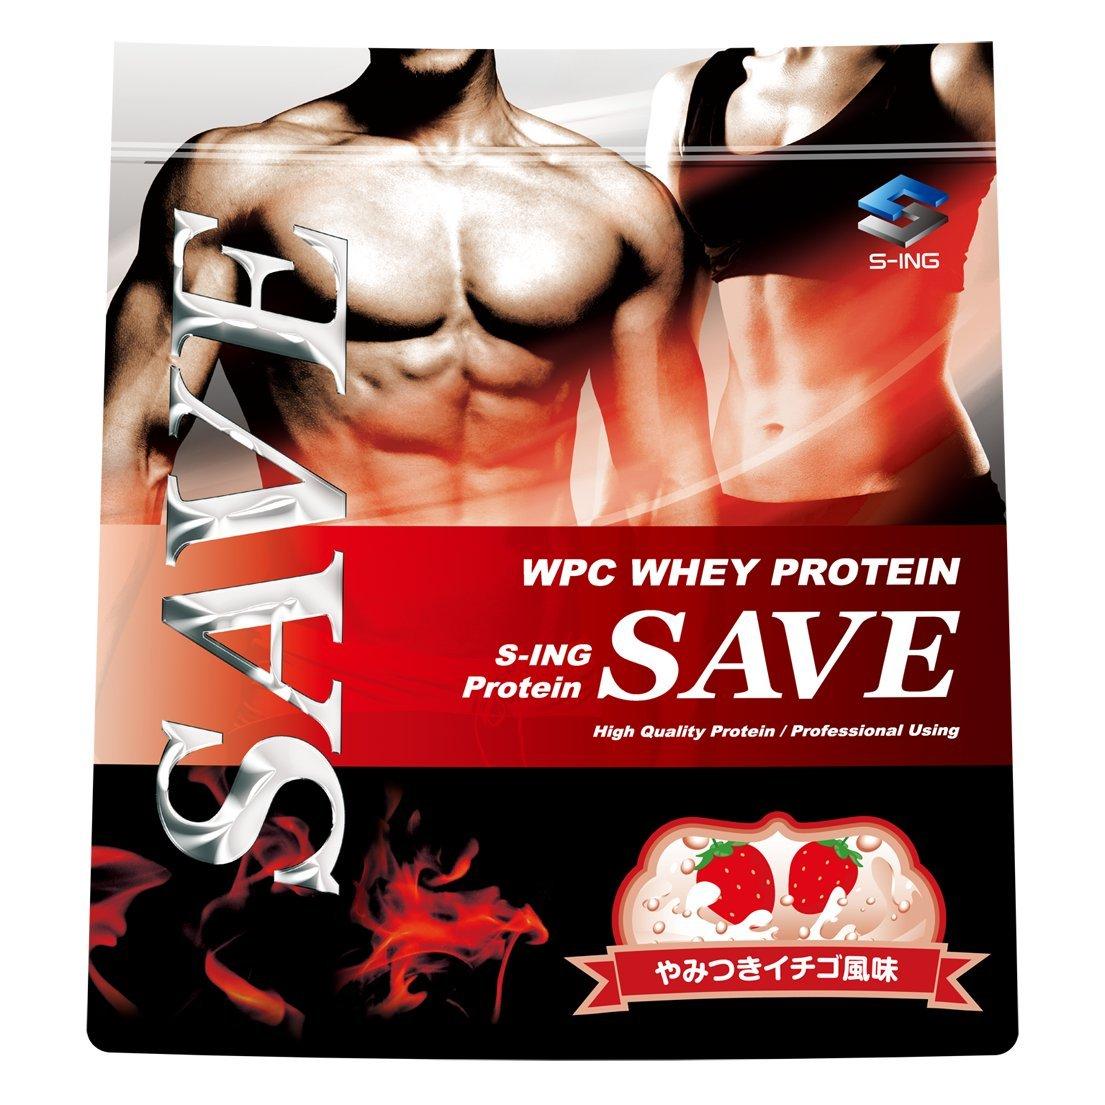 SAVE プロテイン やみつきイチゴ風味 5kg 美味しいWPC ホエイプロテイン 乳酸菌バイオペリンエンザミン酵素配合 B07DVK1S8S